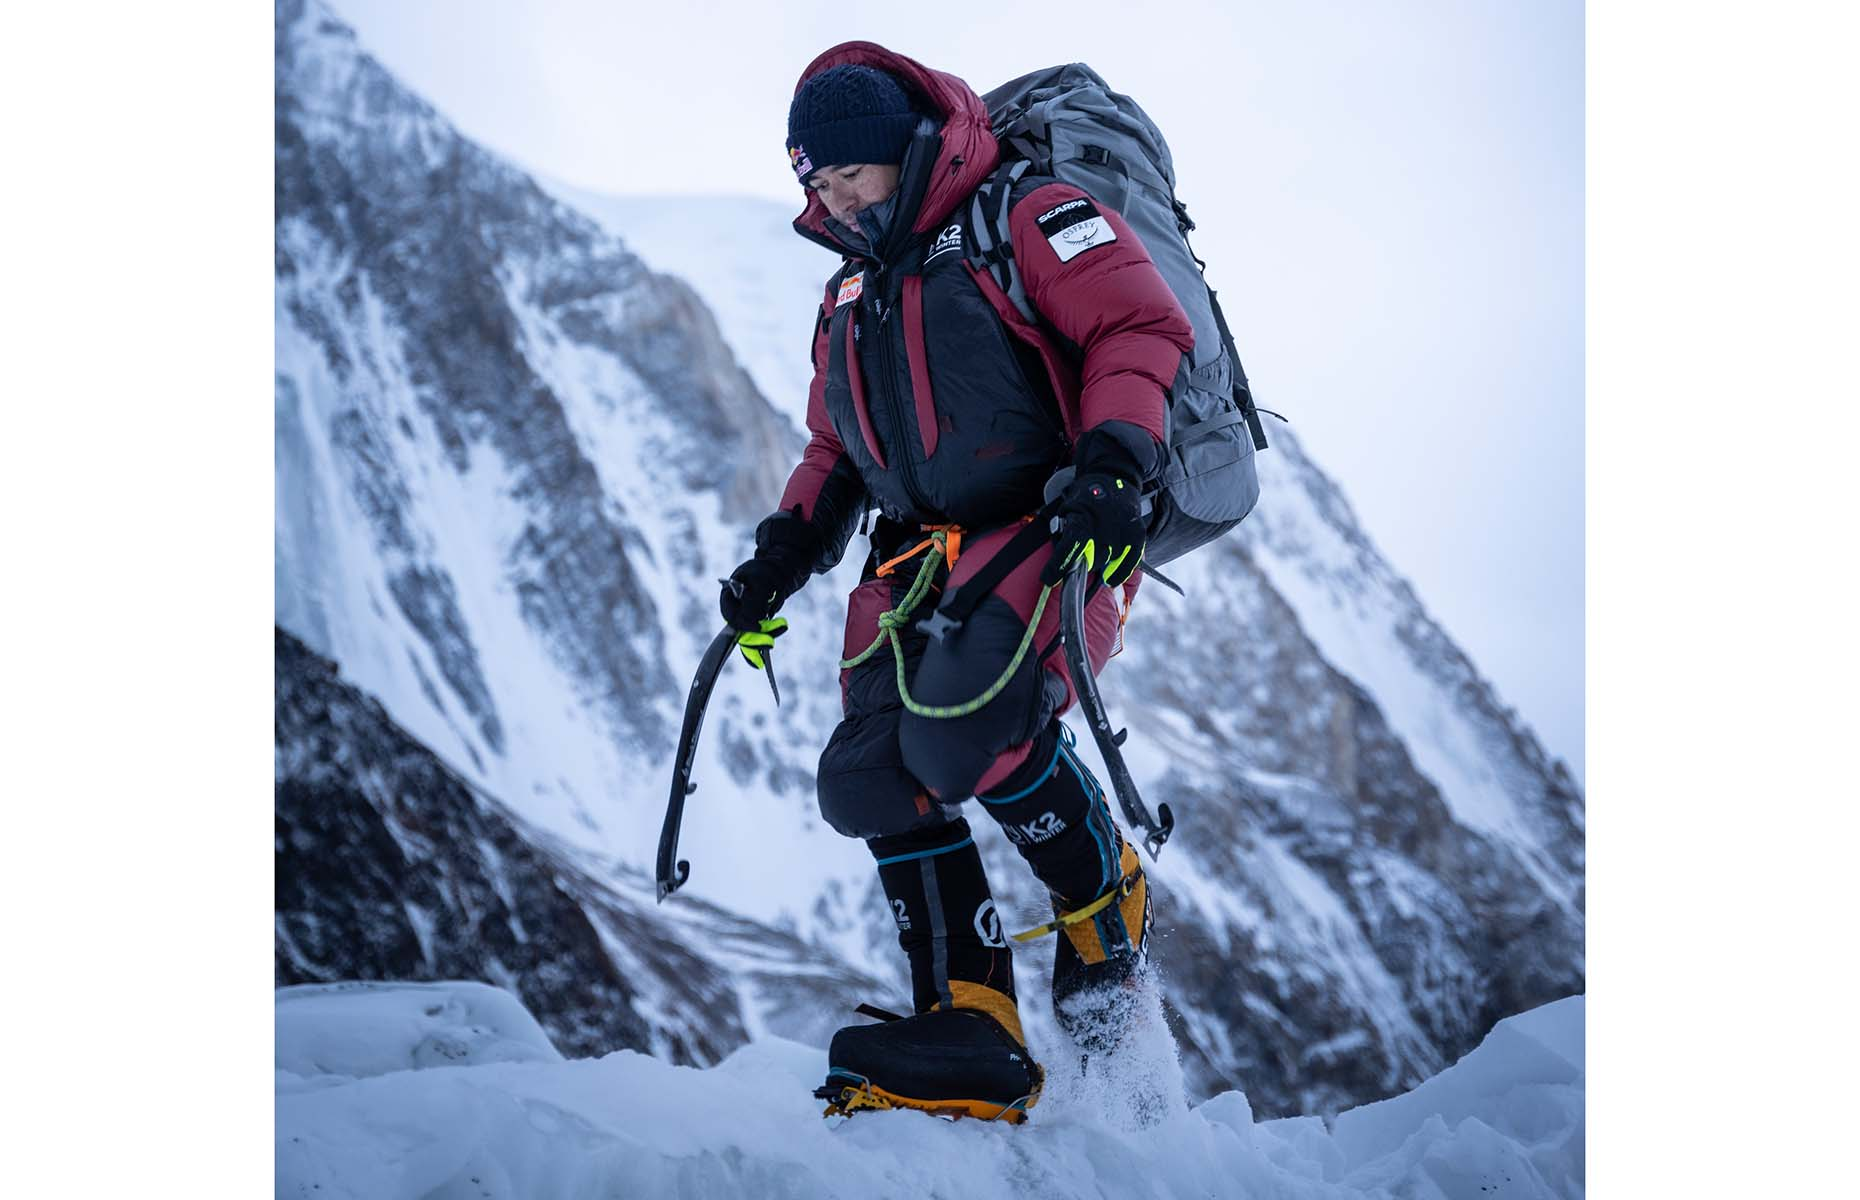 Nims climbing K2 in winter